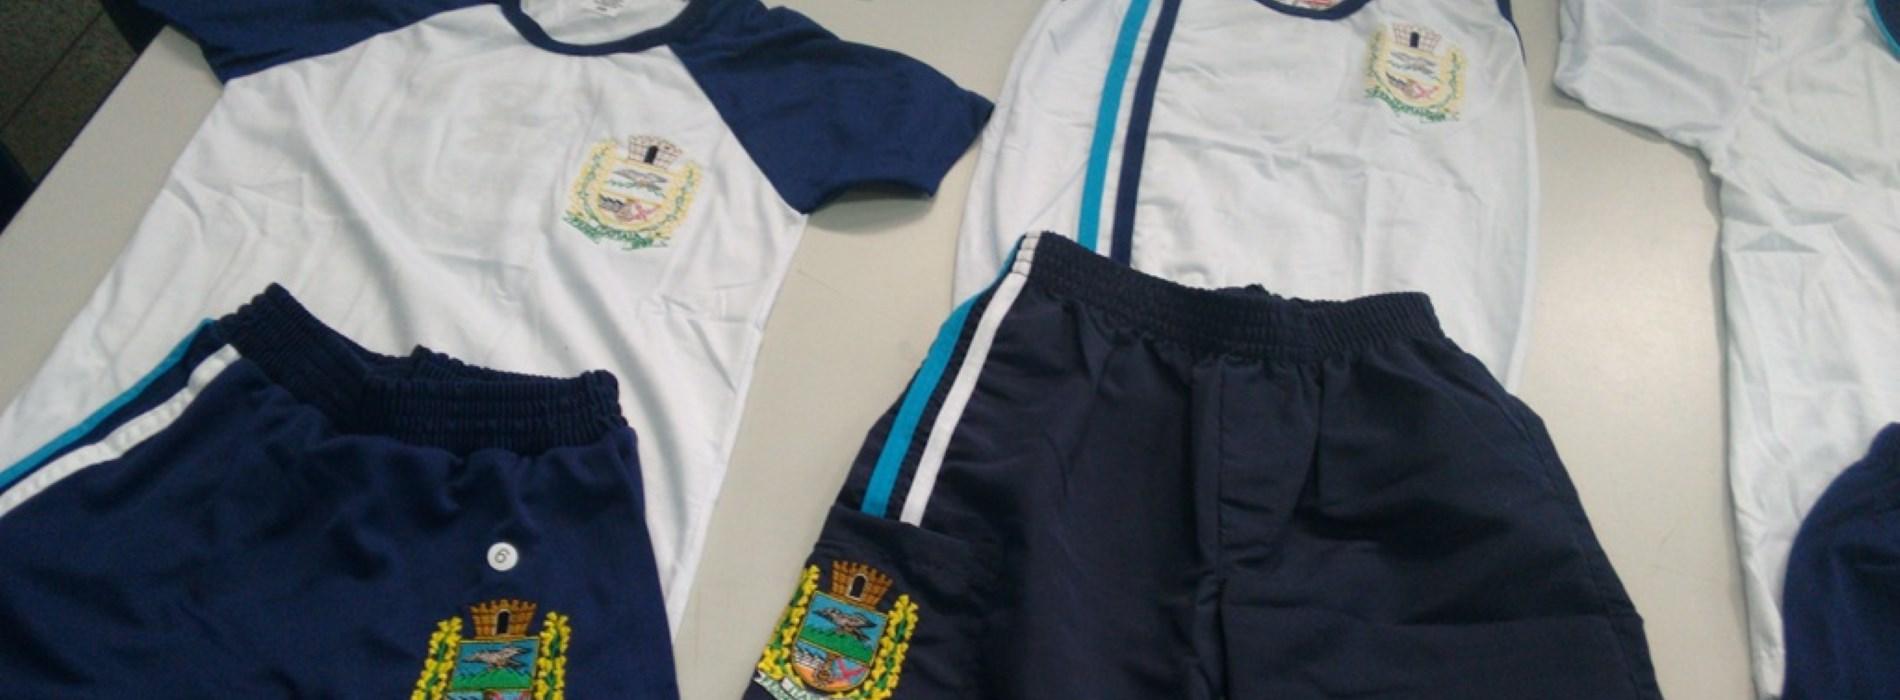 5d527ba80d96e Secretaria de Educação de Itatiaia entrega uniformes escolares ...